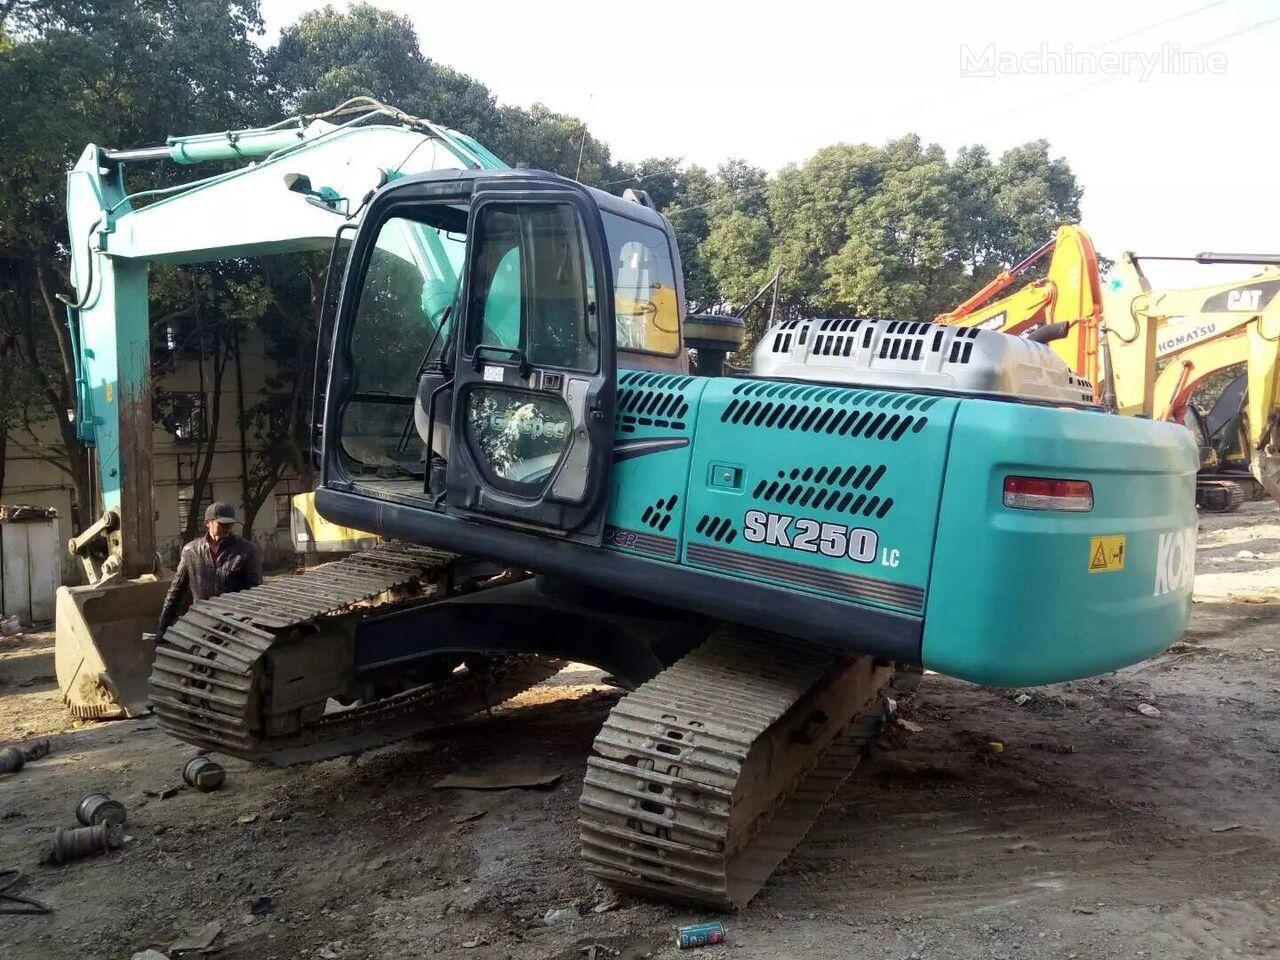 KOBELCO SK250 tracked excavator